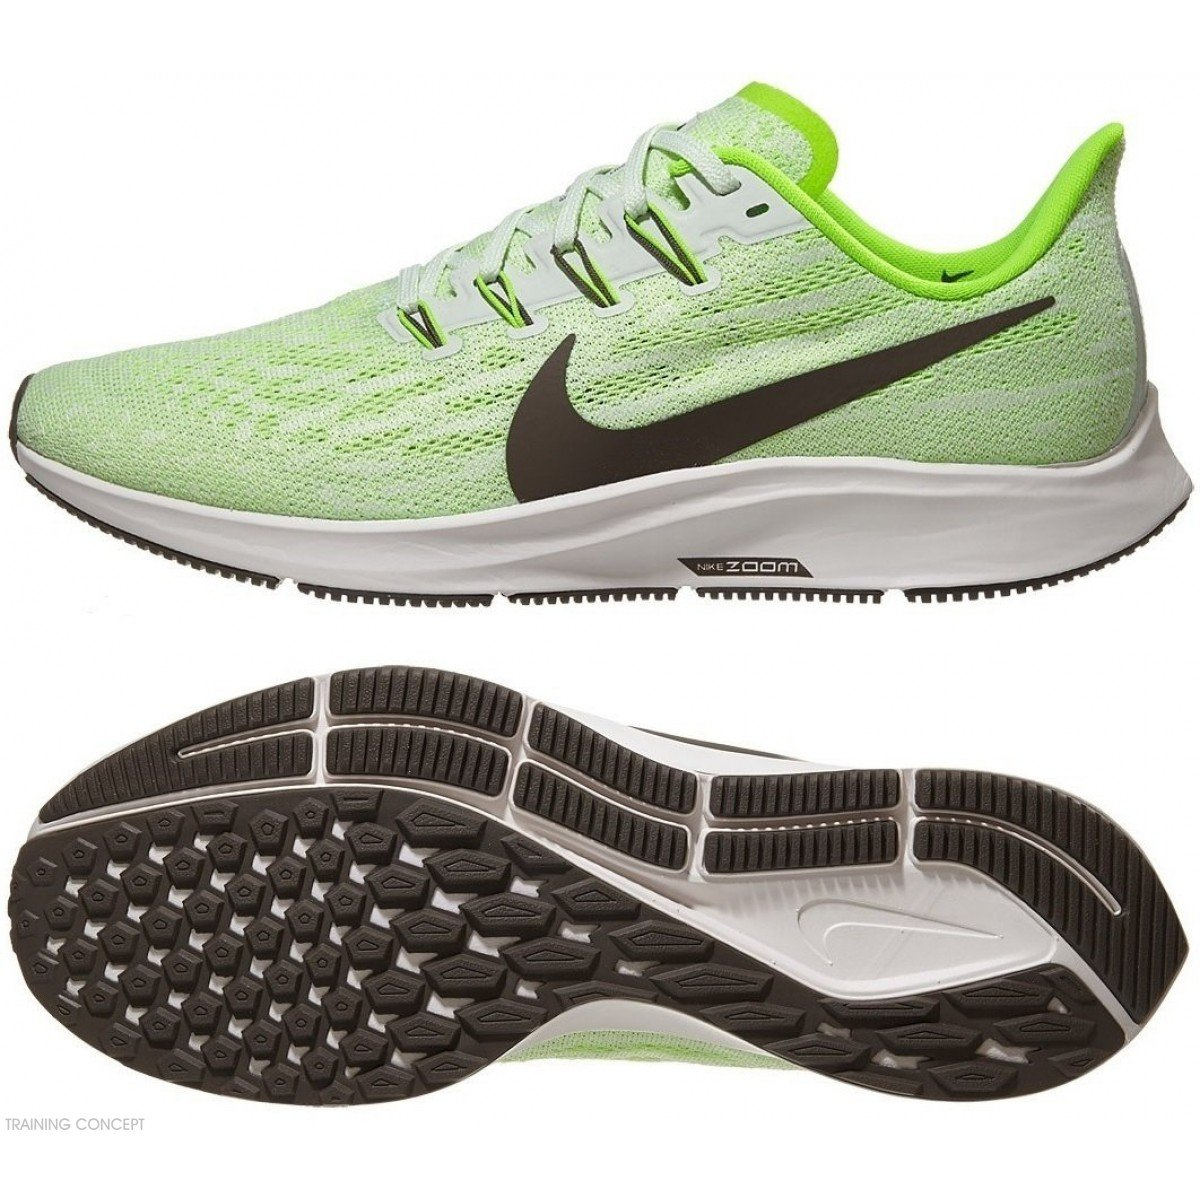 Chaussure 36 Hommes Nike Air Aq2203 003 Zoom De Running Pour Pegasus QxerWBdCo